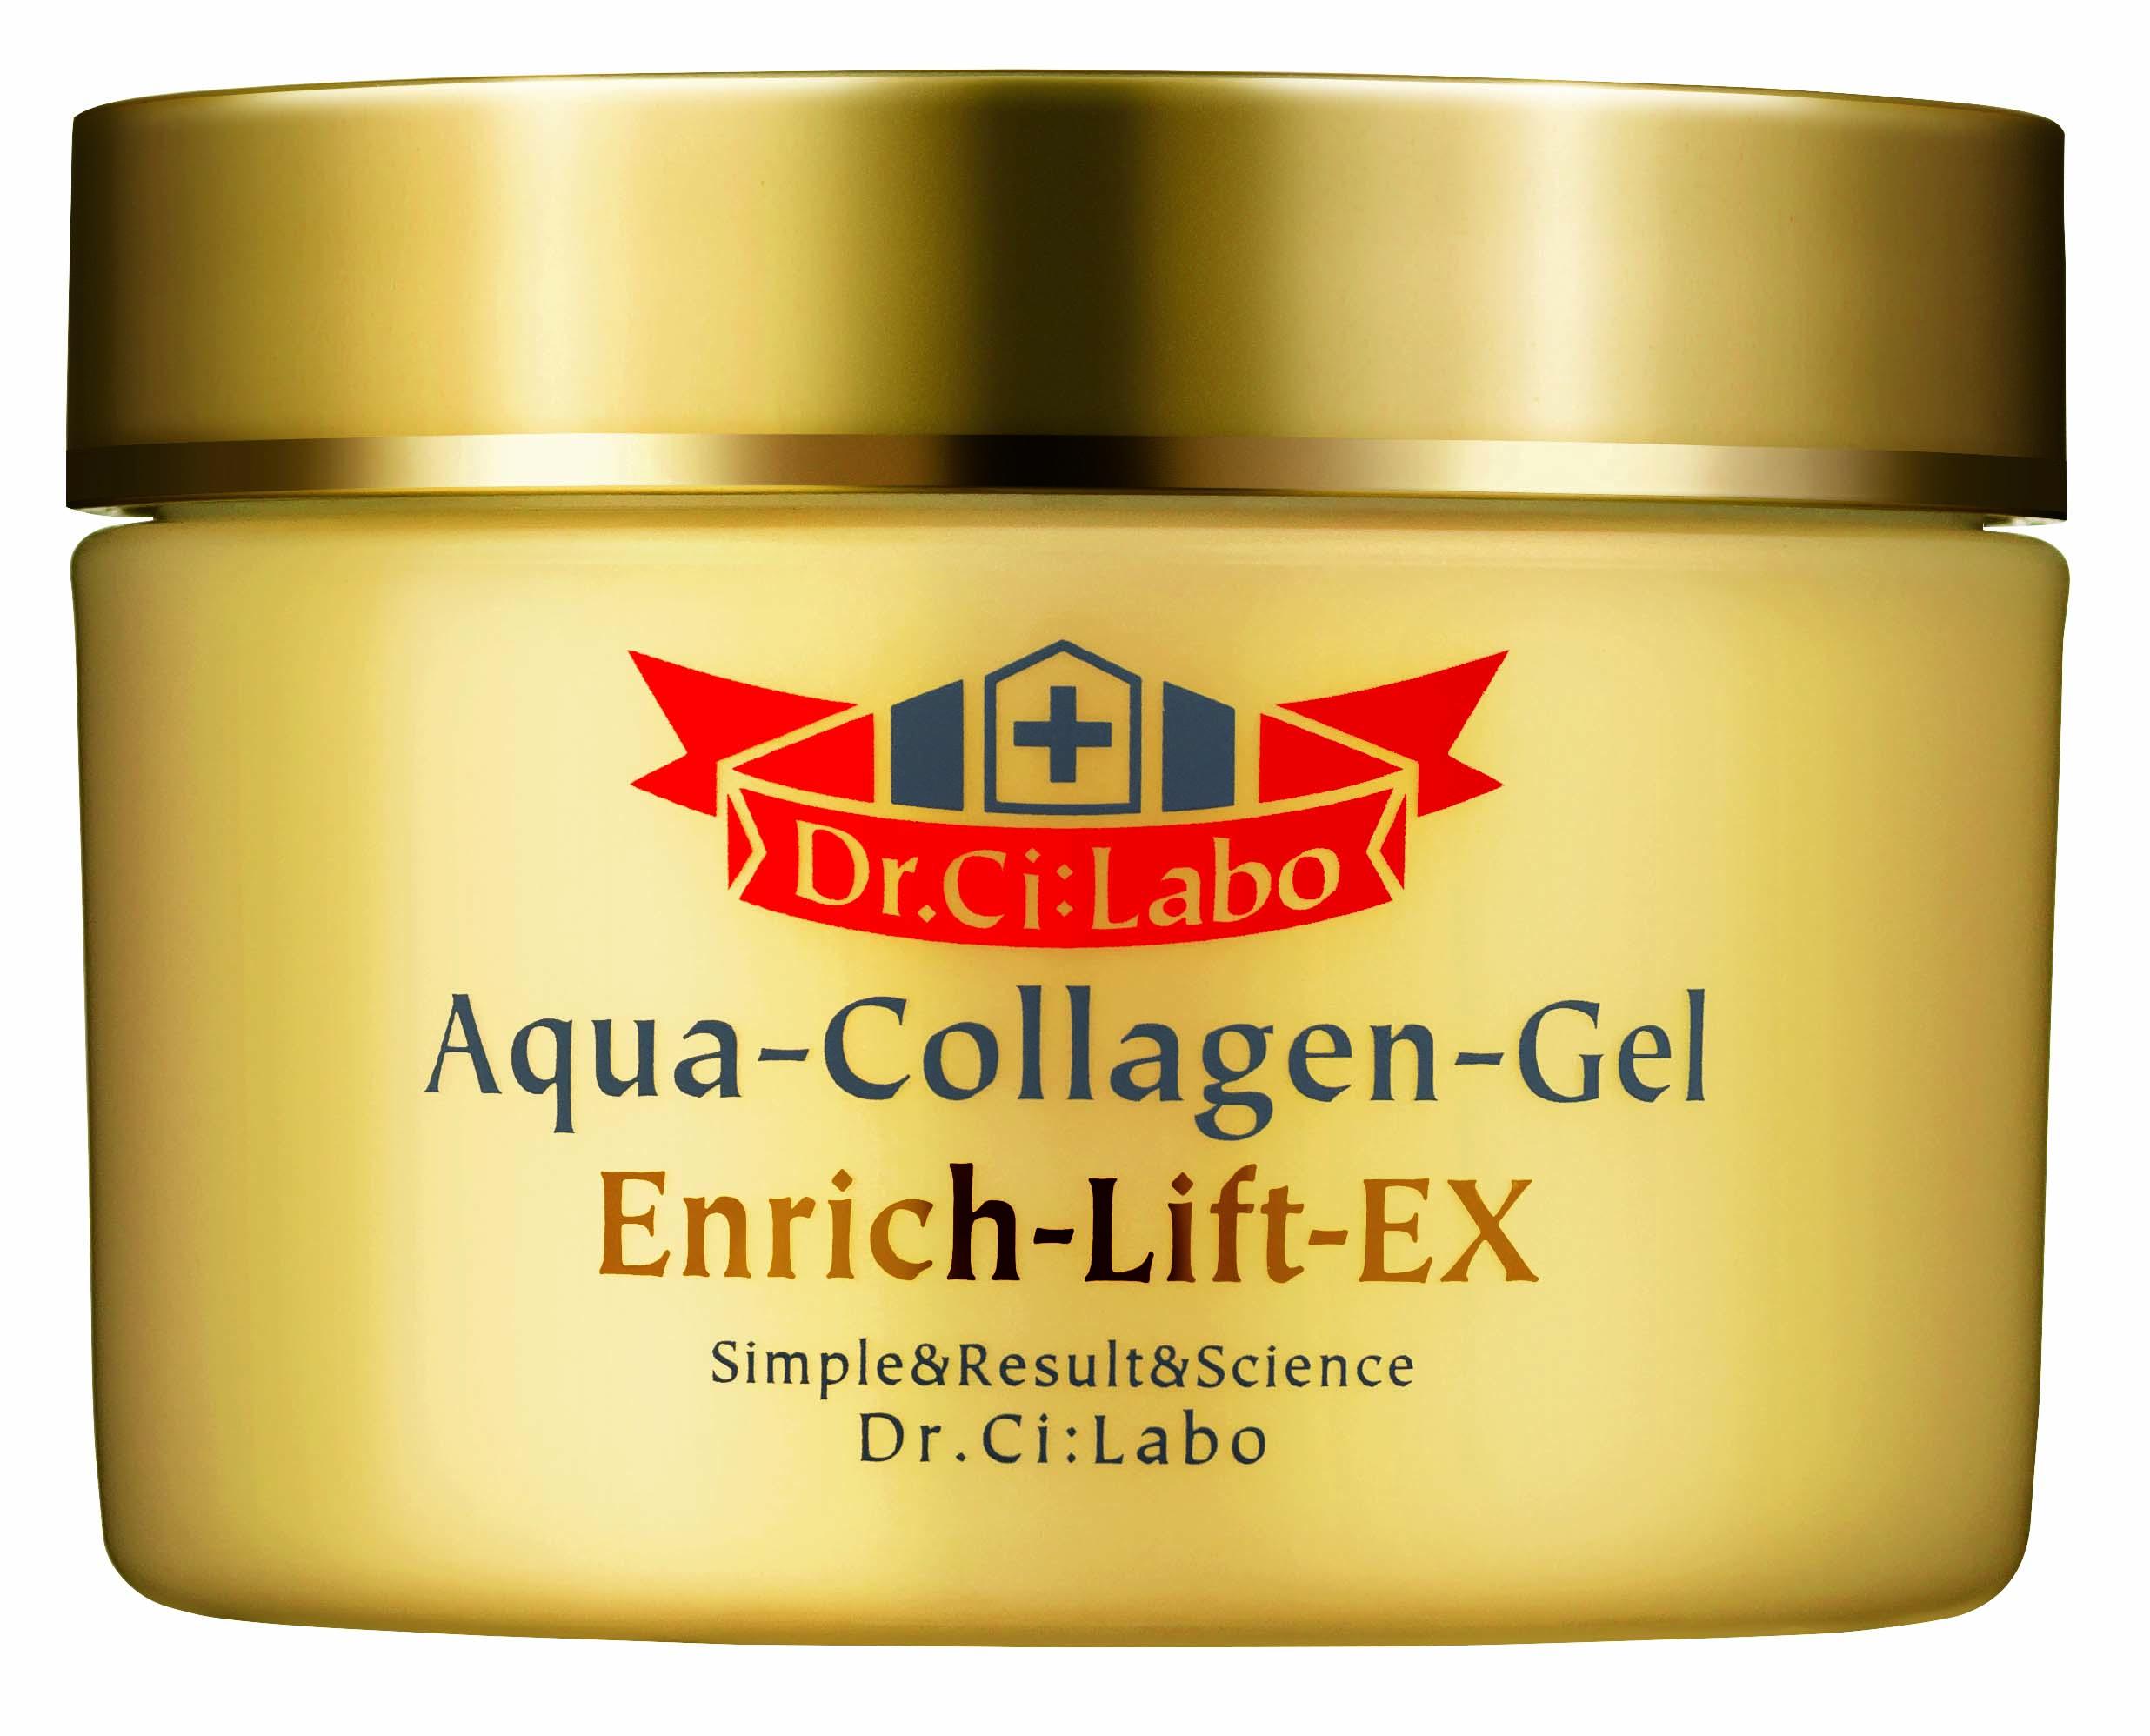 Dr.Ci:Labo, 3D黃金緊緻膠原滋養凝露, 黃金乳霜, 抗皺乳霜, 緊緻拉提, 彈潤, 肌膚彈性, 修復肌膚, 肌膚老化, 凍齡, 試用, 體驗